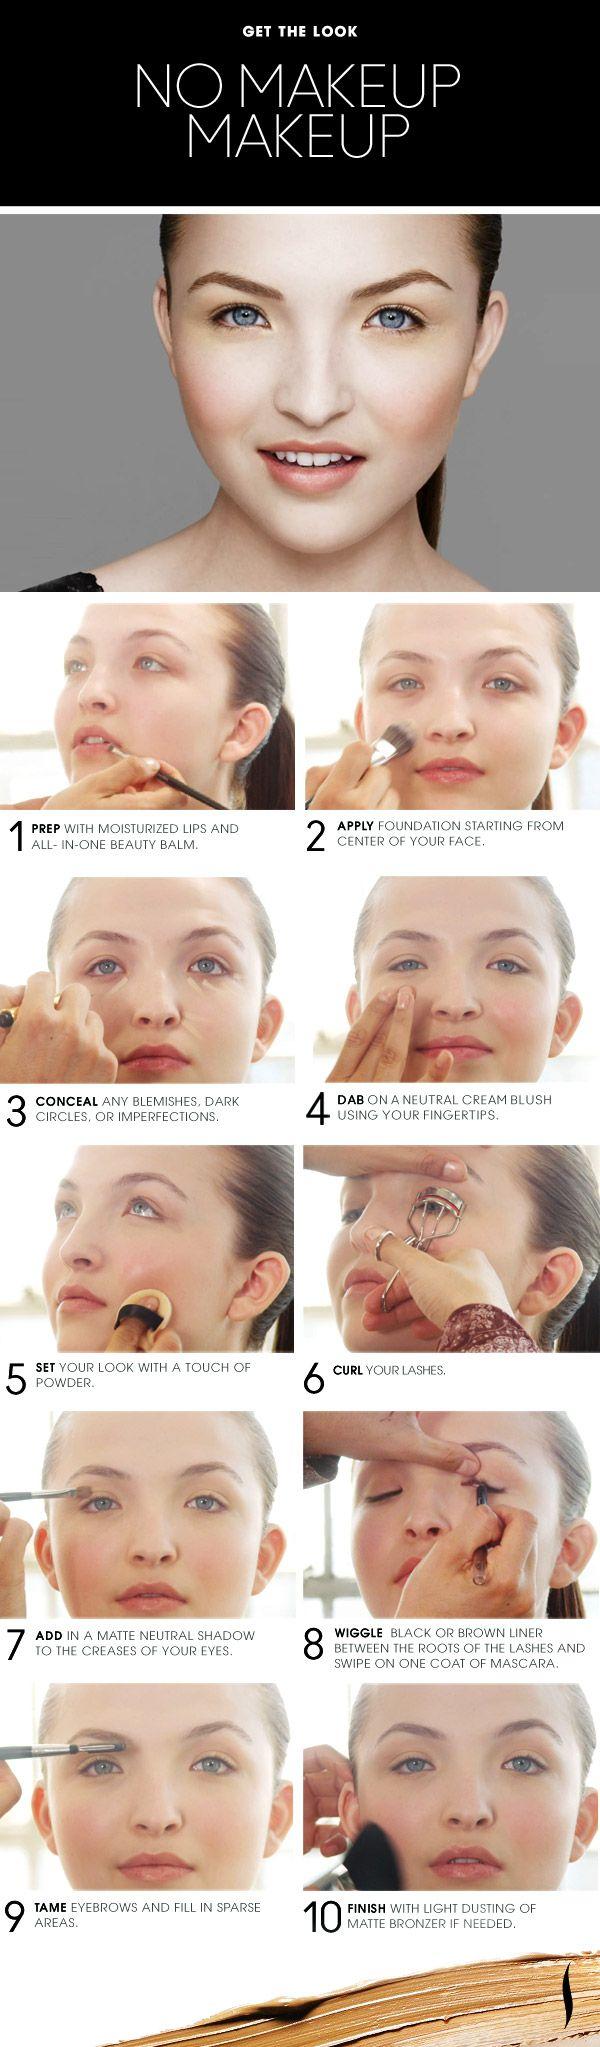 Beauty How To: The No Makeup Makeup Look #Sephora